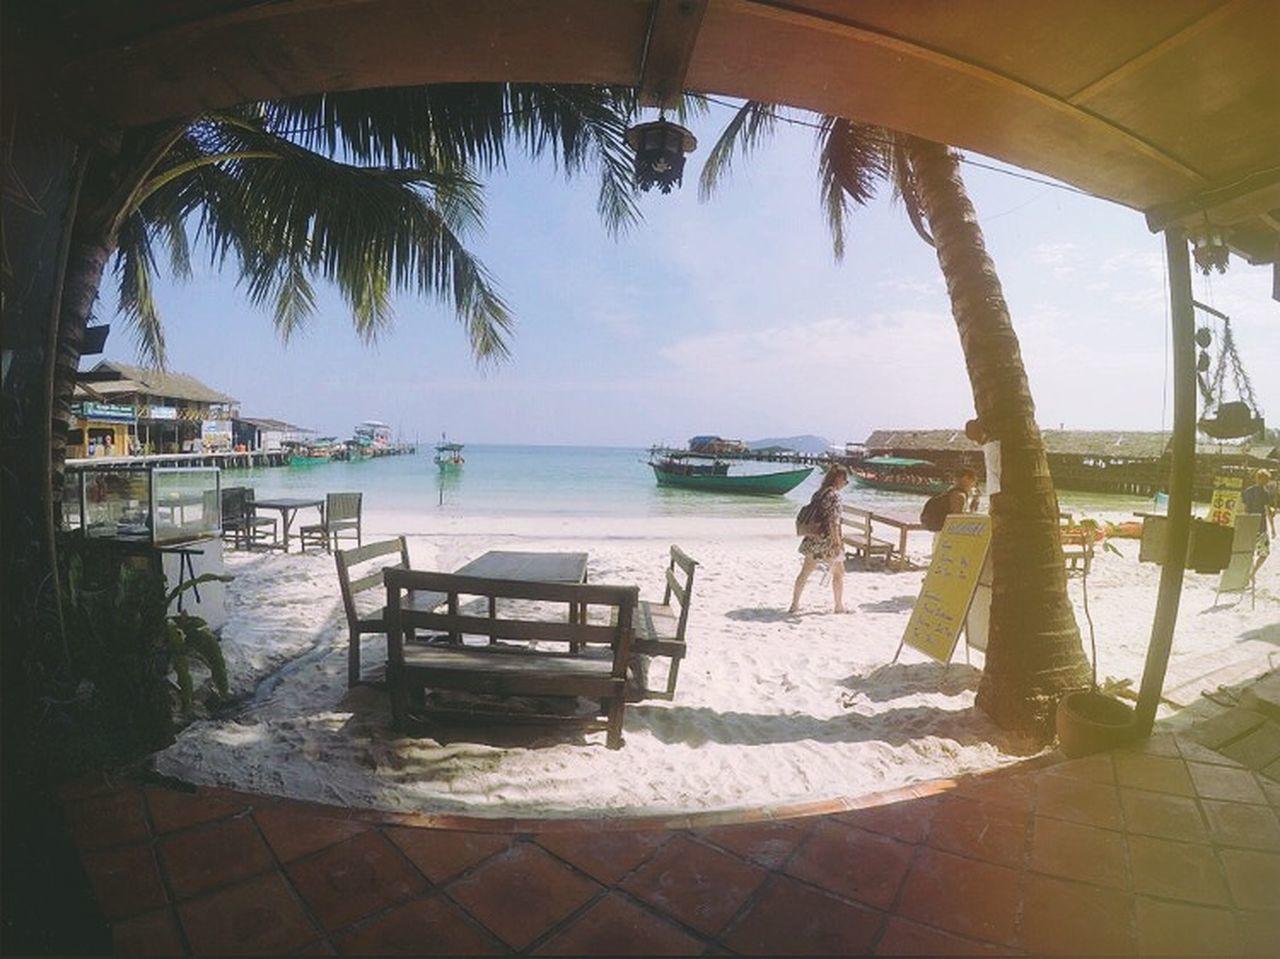 Kohrong Cambodia ASIA Wanderlust Travel Travel Photography Island Islandlife Beach Sihanoukville Banana Trail Gapyear 2015  First Eyeem Photo